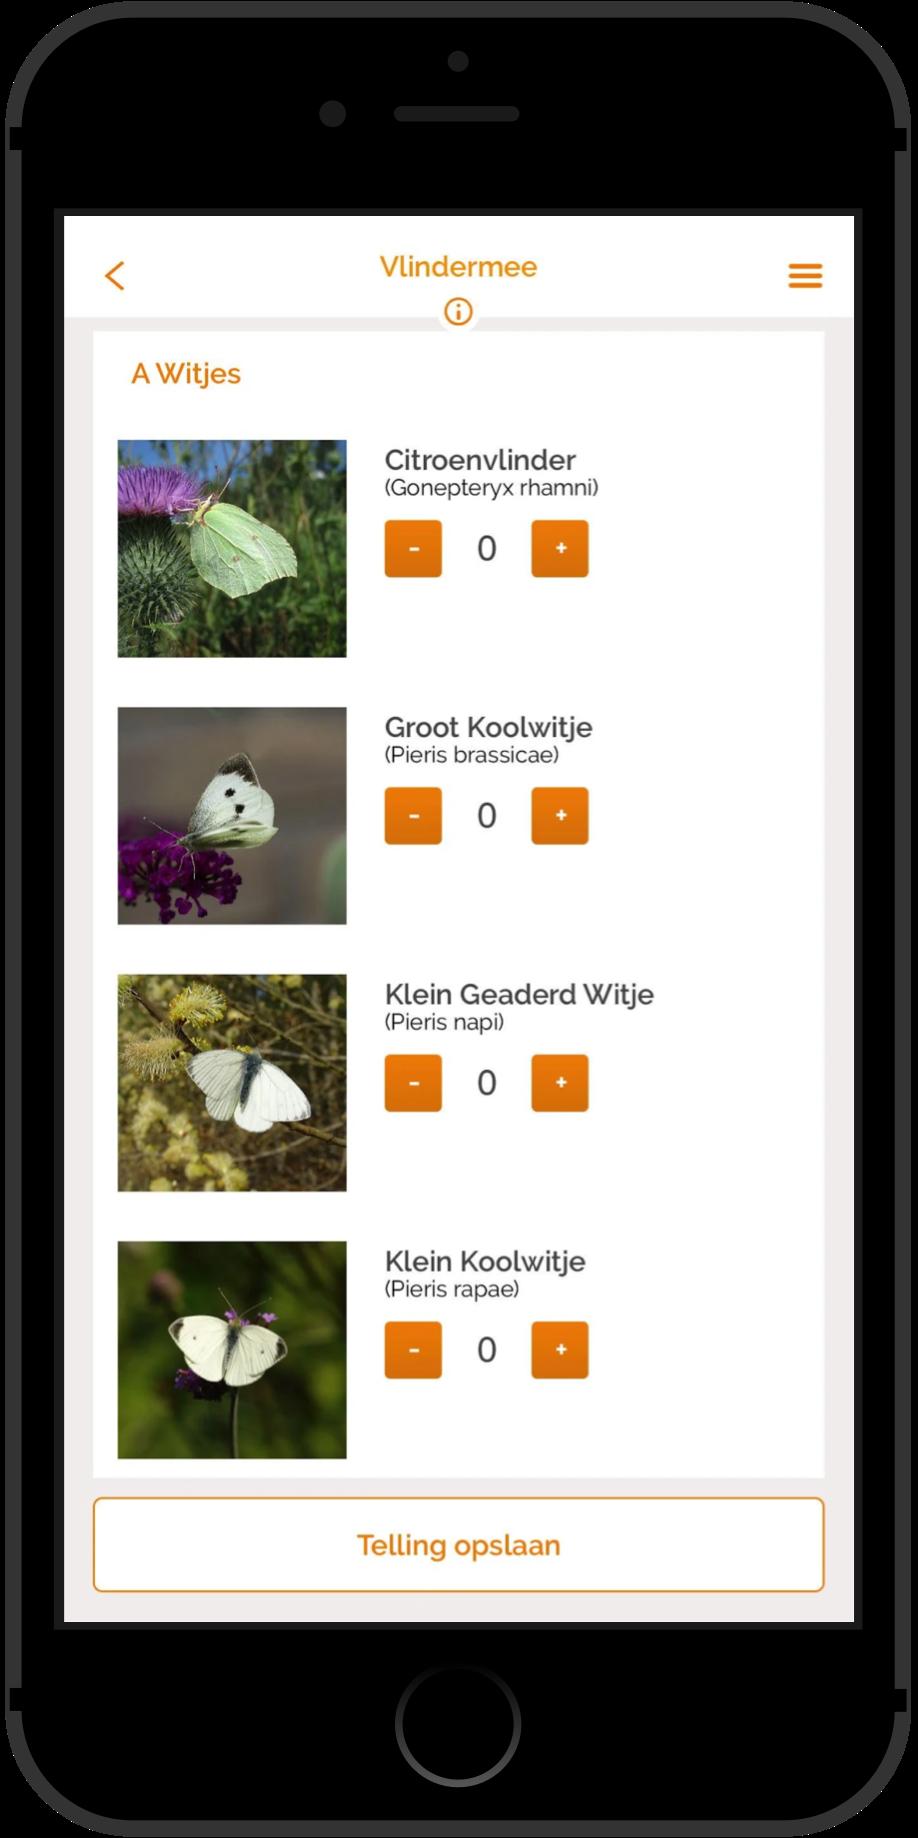 Vlinderstichting Nederland Vlindermee iPhone App